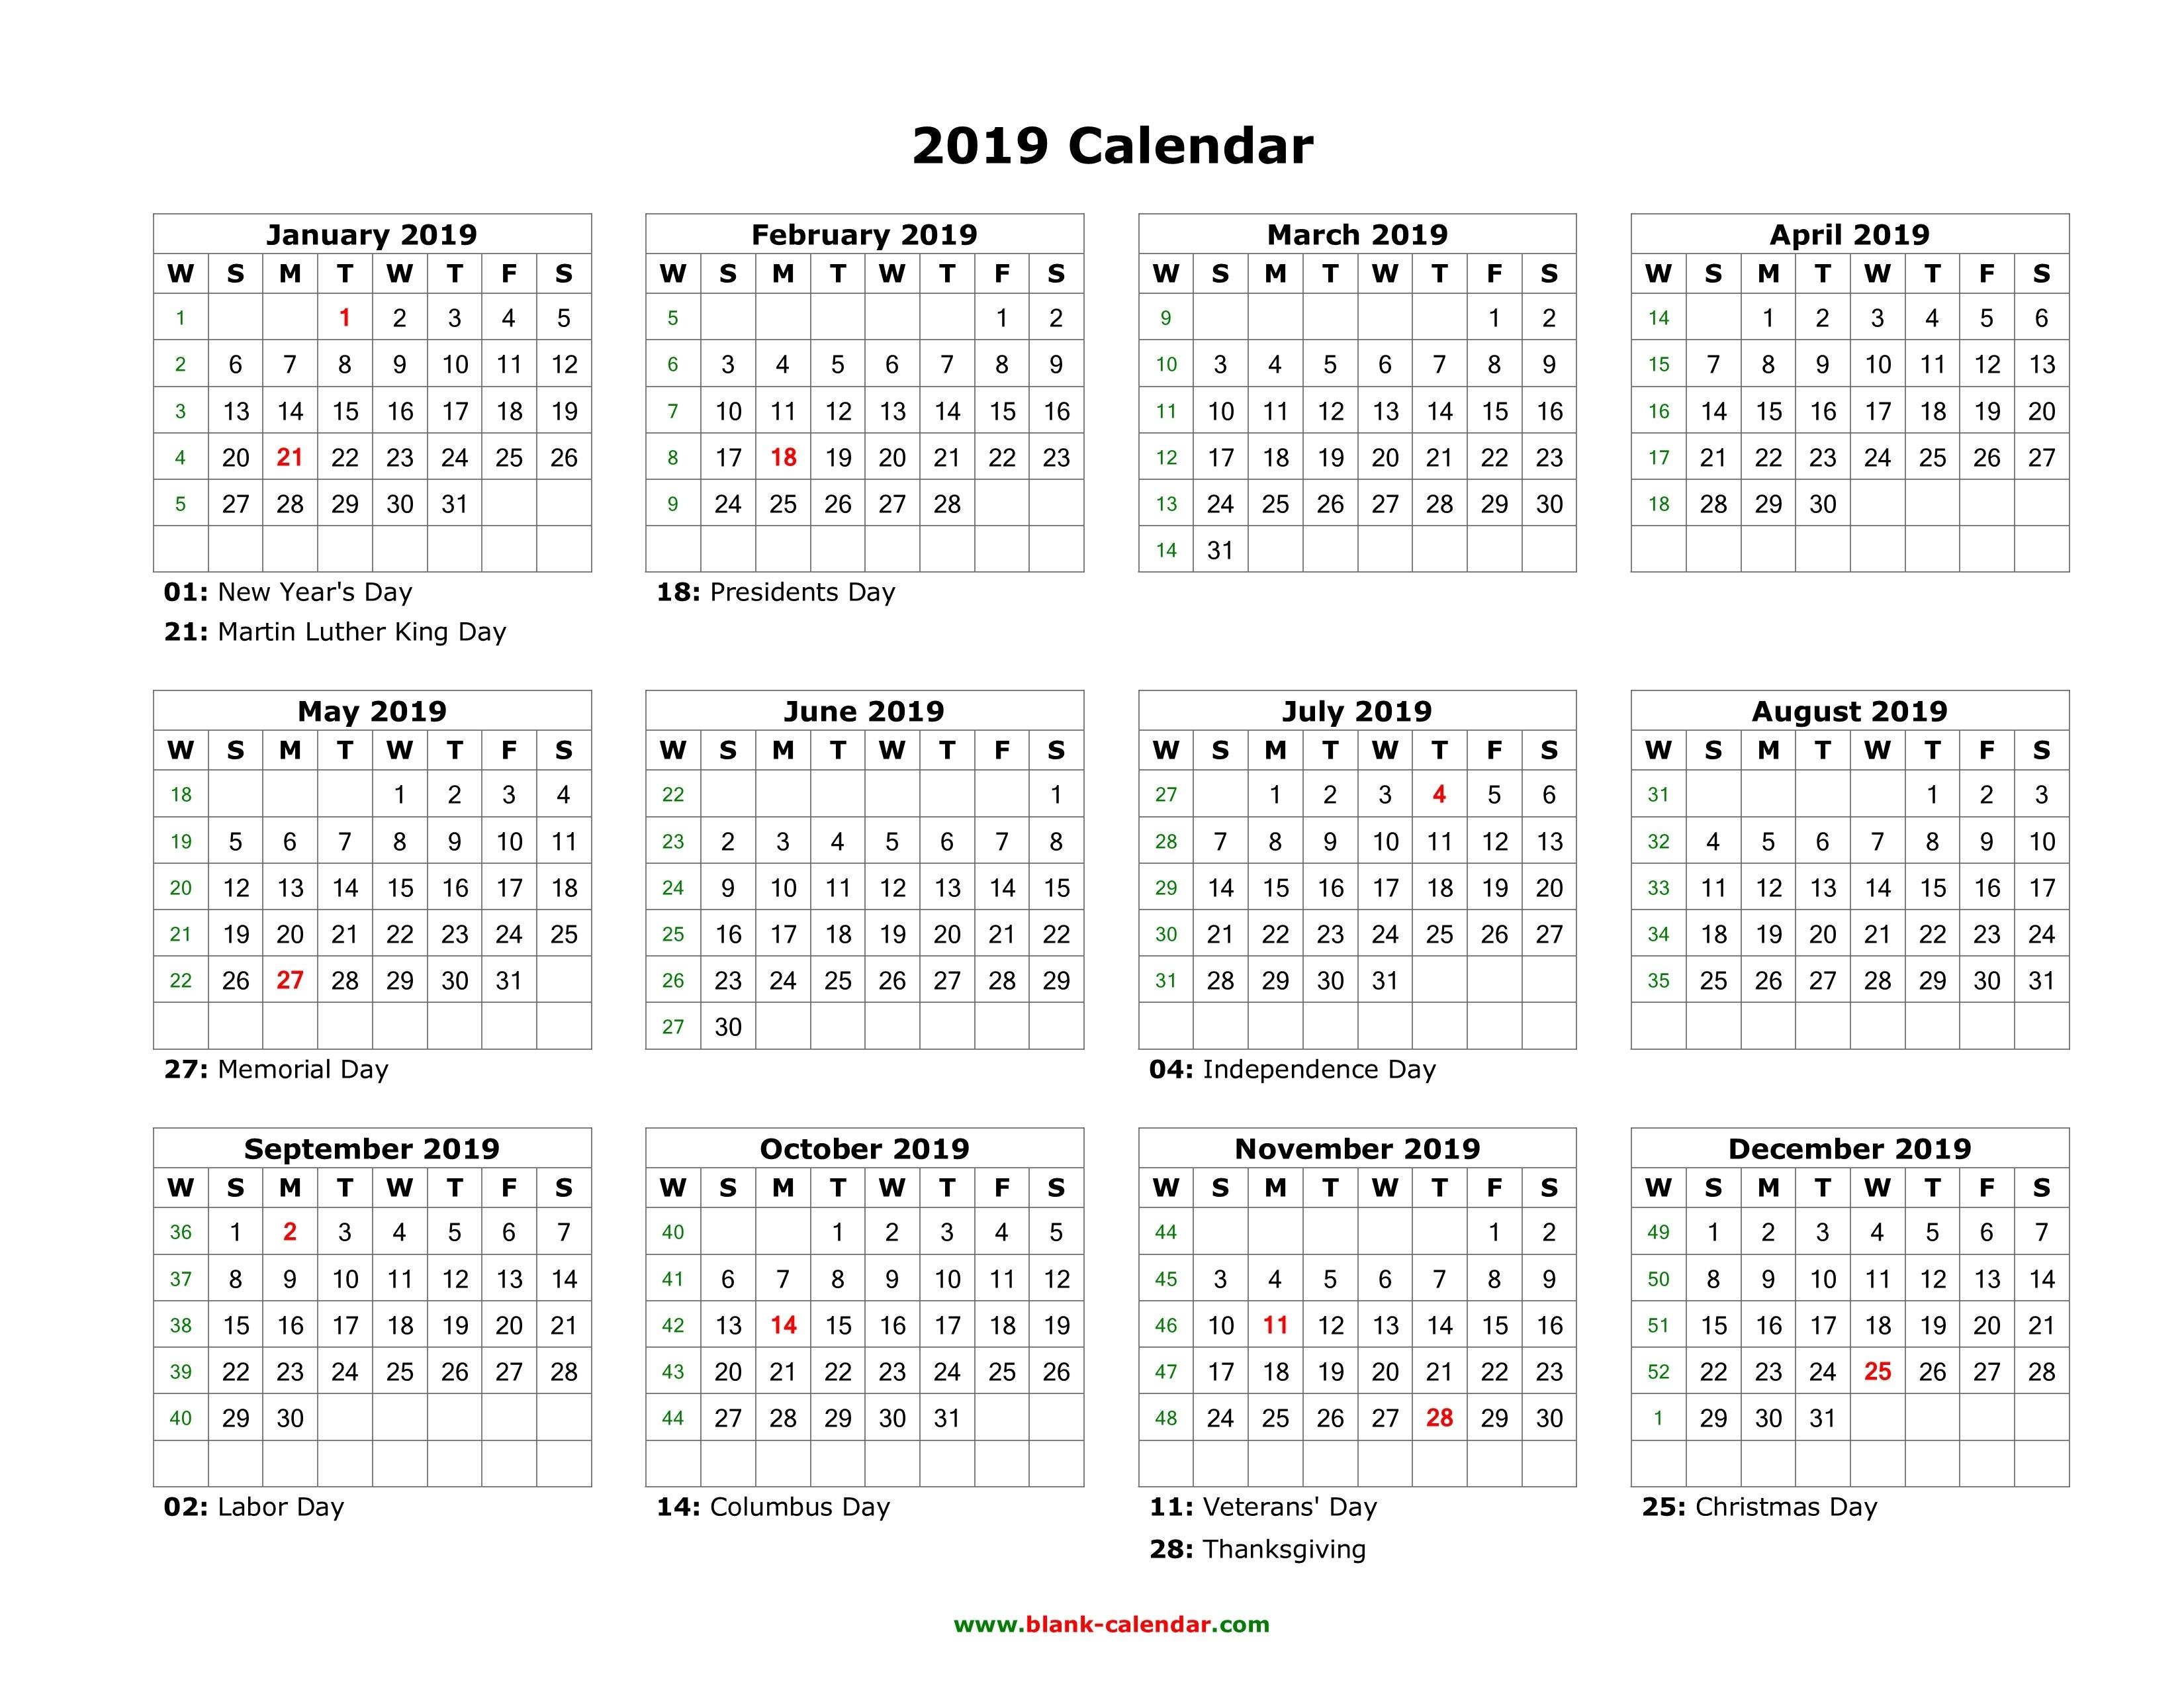 Blank Calendar 2019 | Free Download Calendar Templates Calendar 2019 Year